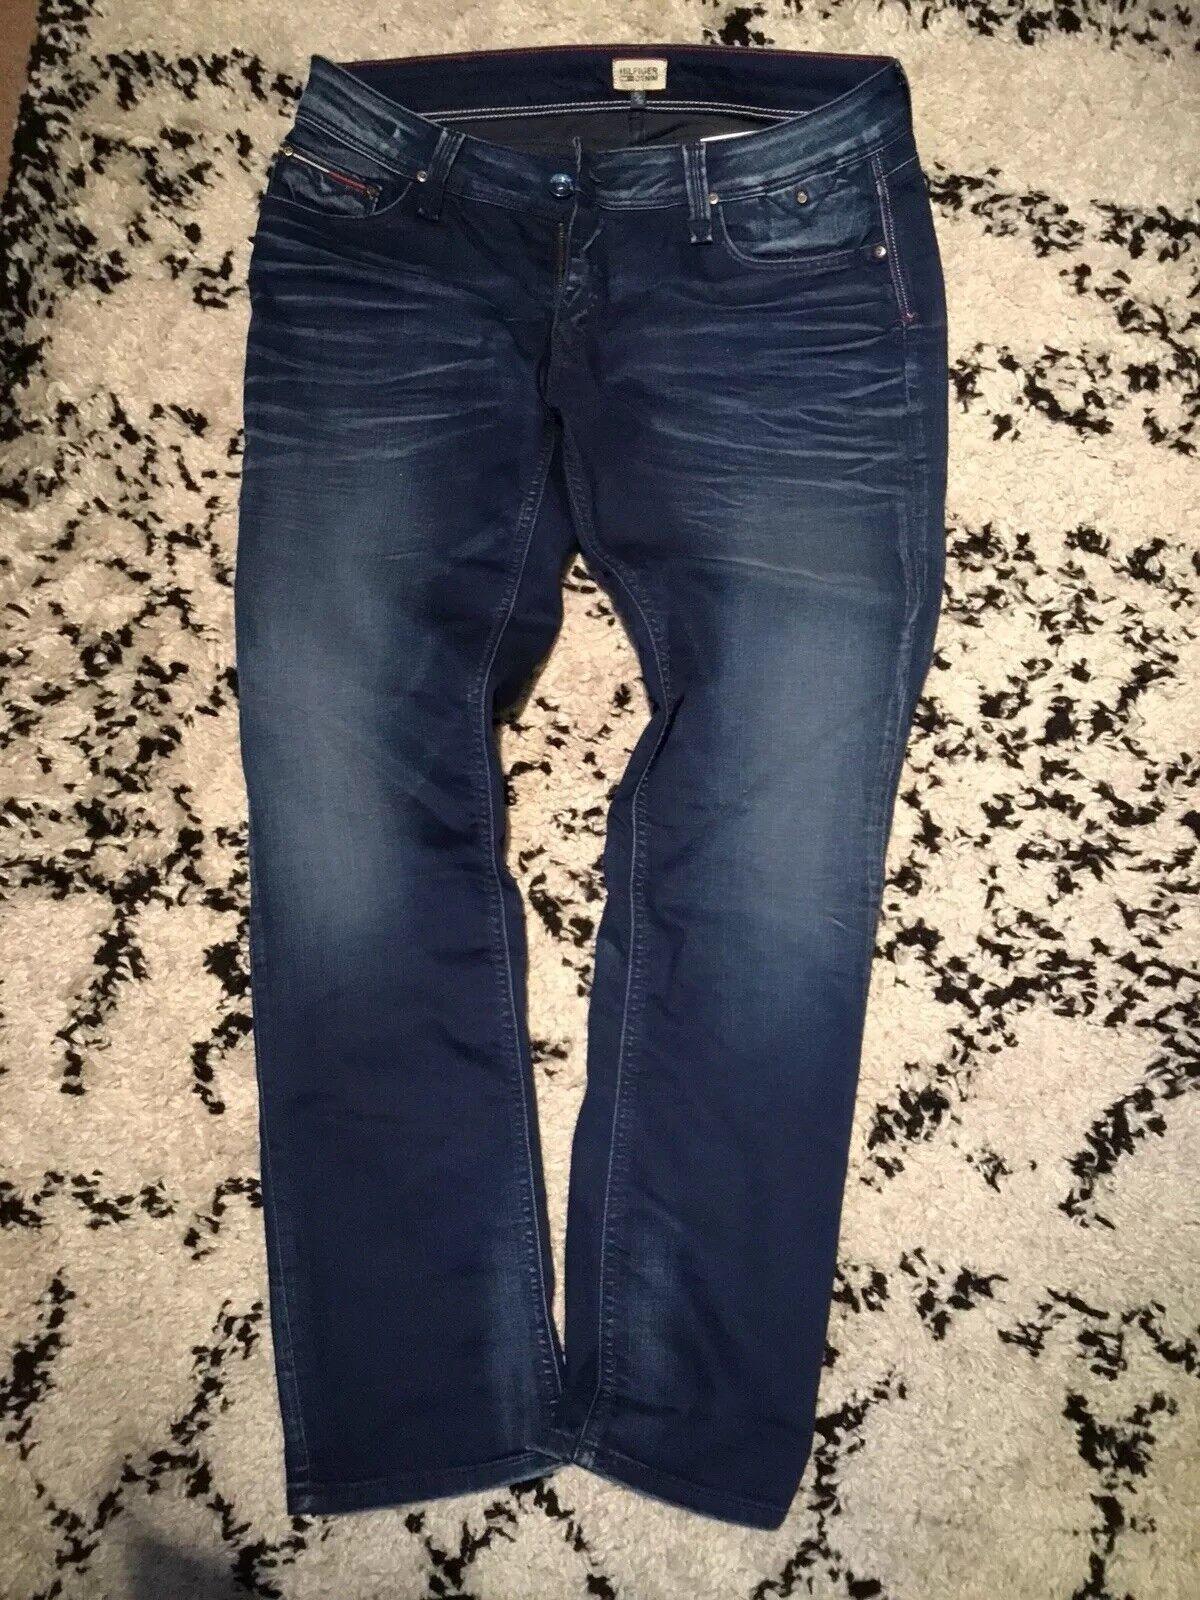 bluee Hilfiger Denim Suzzy Straight Leg Jeans - UK Size 31 30